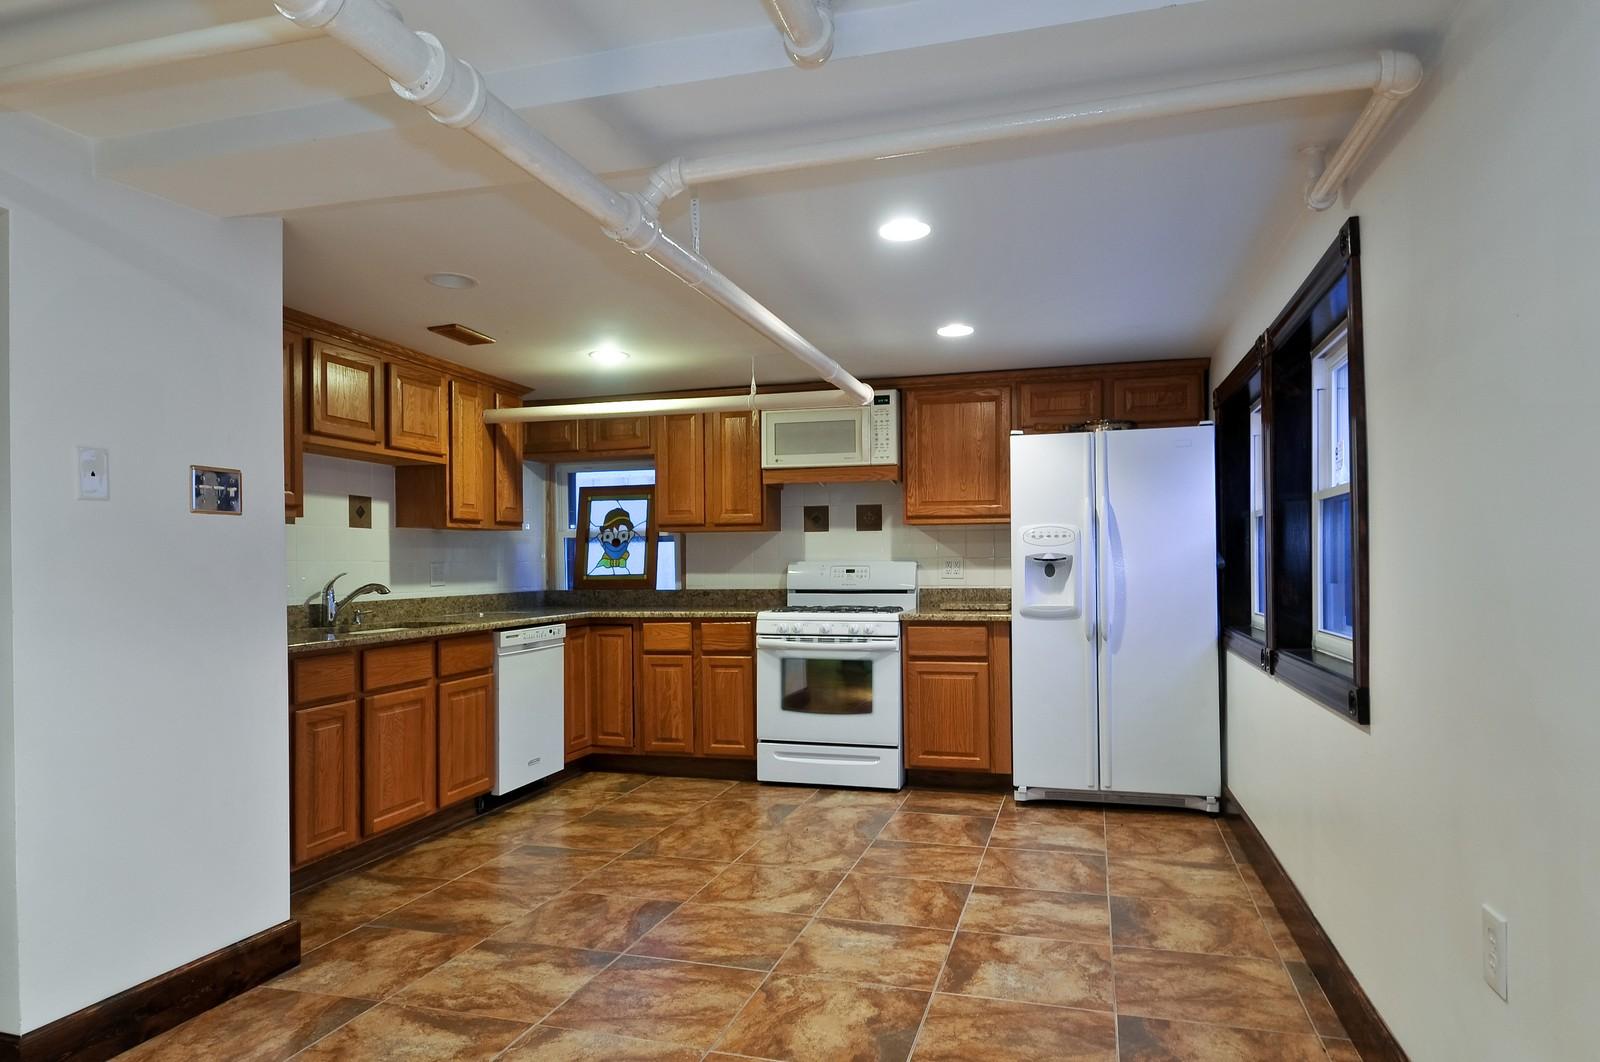 Real Estate Photography - 2226 W Pratt, Chicago, IL, 60645 - Kitchen